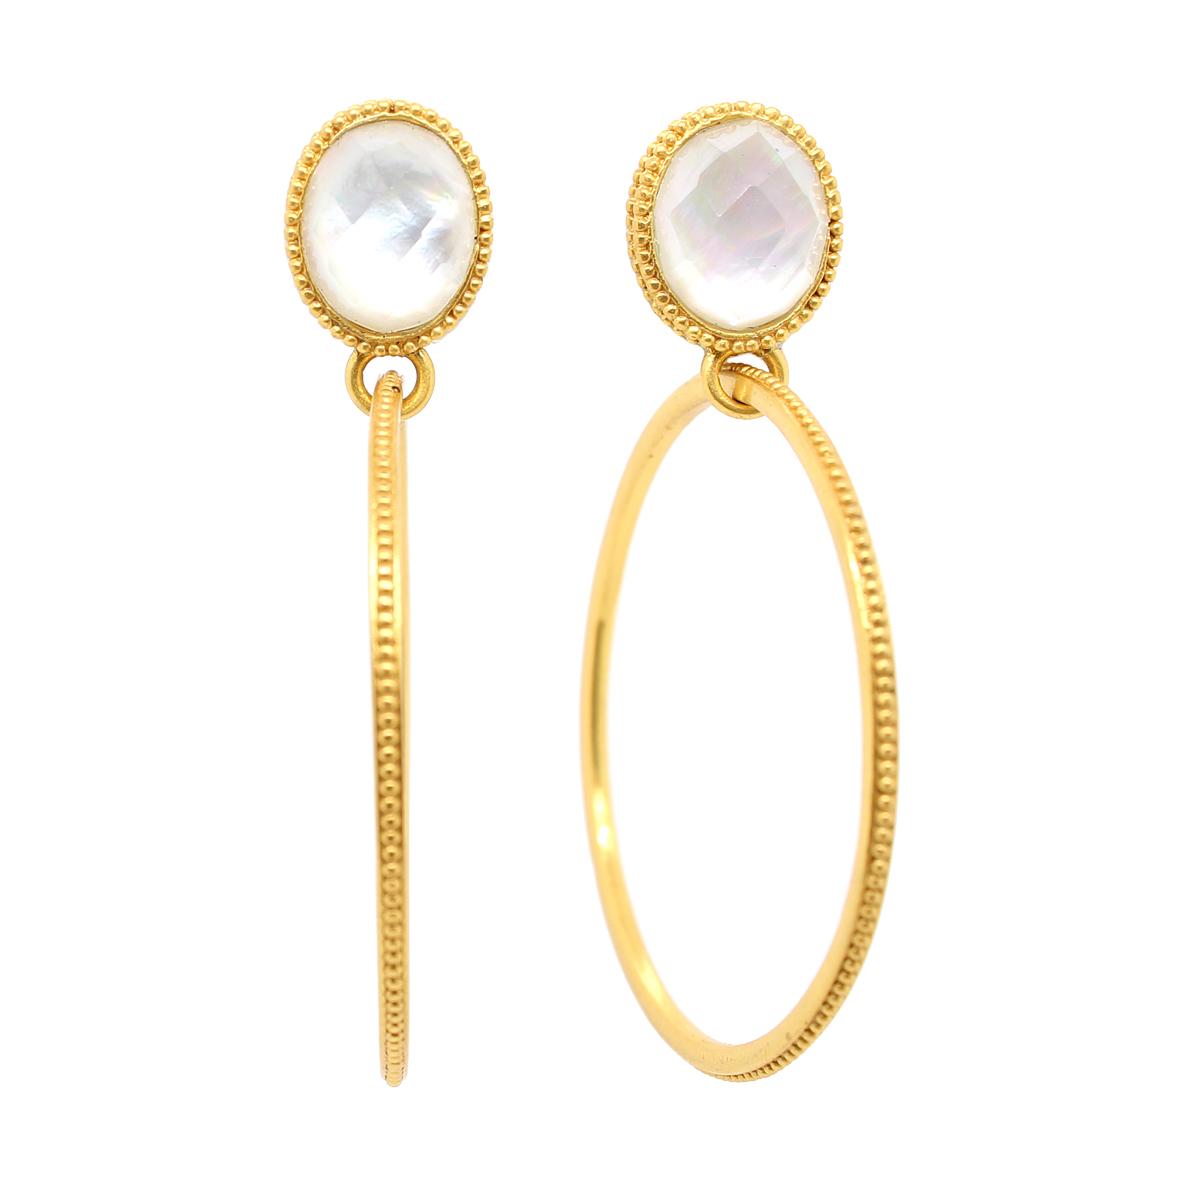 Julie Vos 24 Karat Gold Plated Verona Iridescent Crystal Statement Earrings